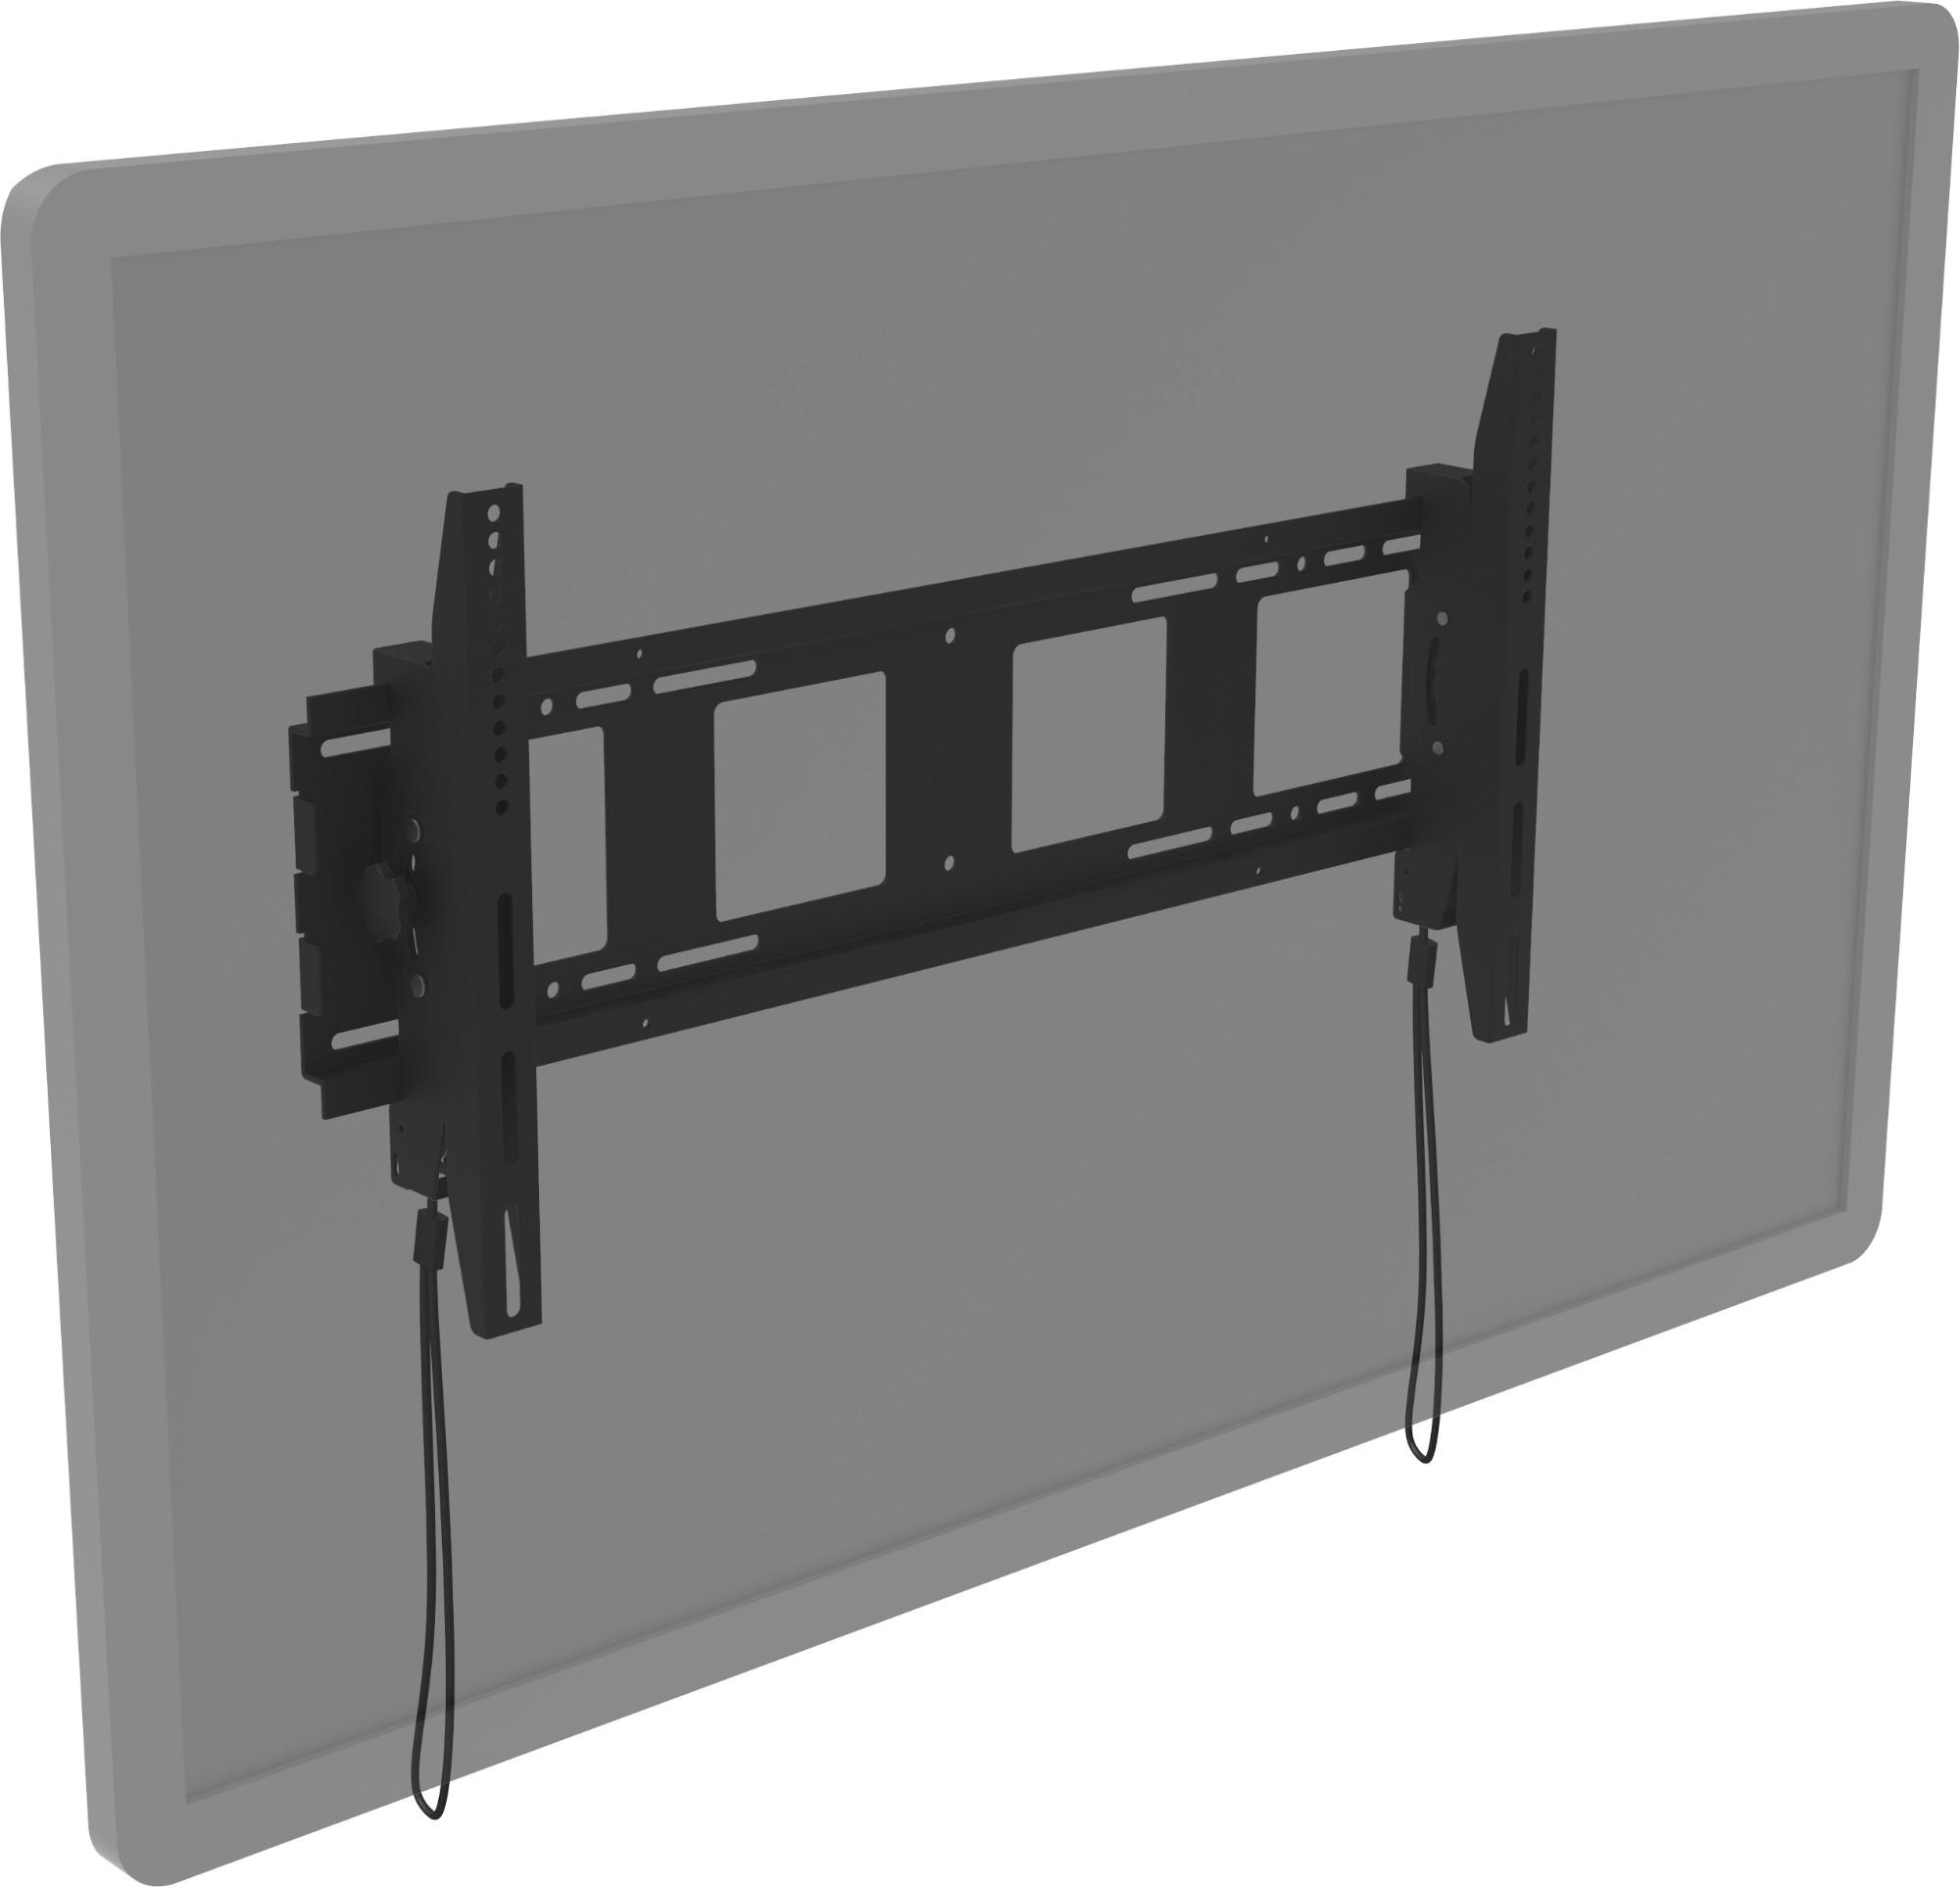 "Vision VFM-W8X4T signage display mount 2.16 m (85"") Black"